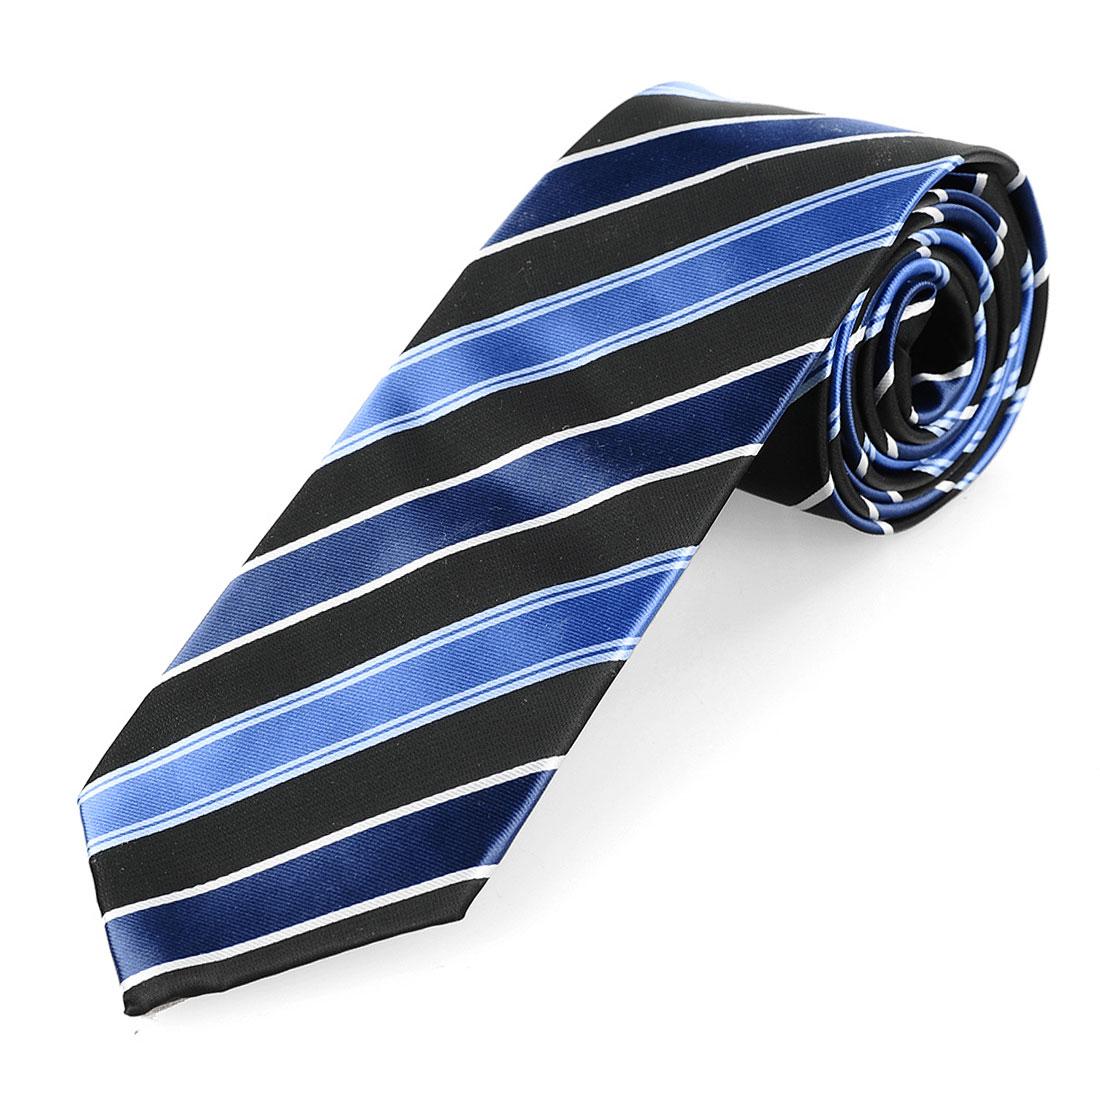 Self Tie Style Striped Wide Necktie Black White Blue for Men